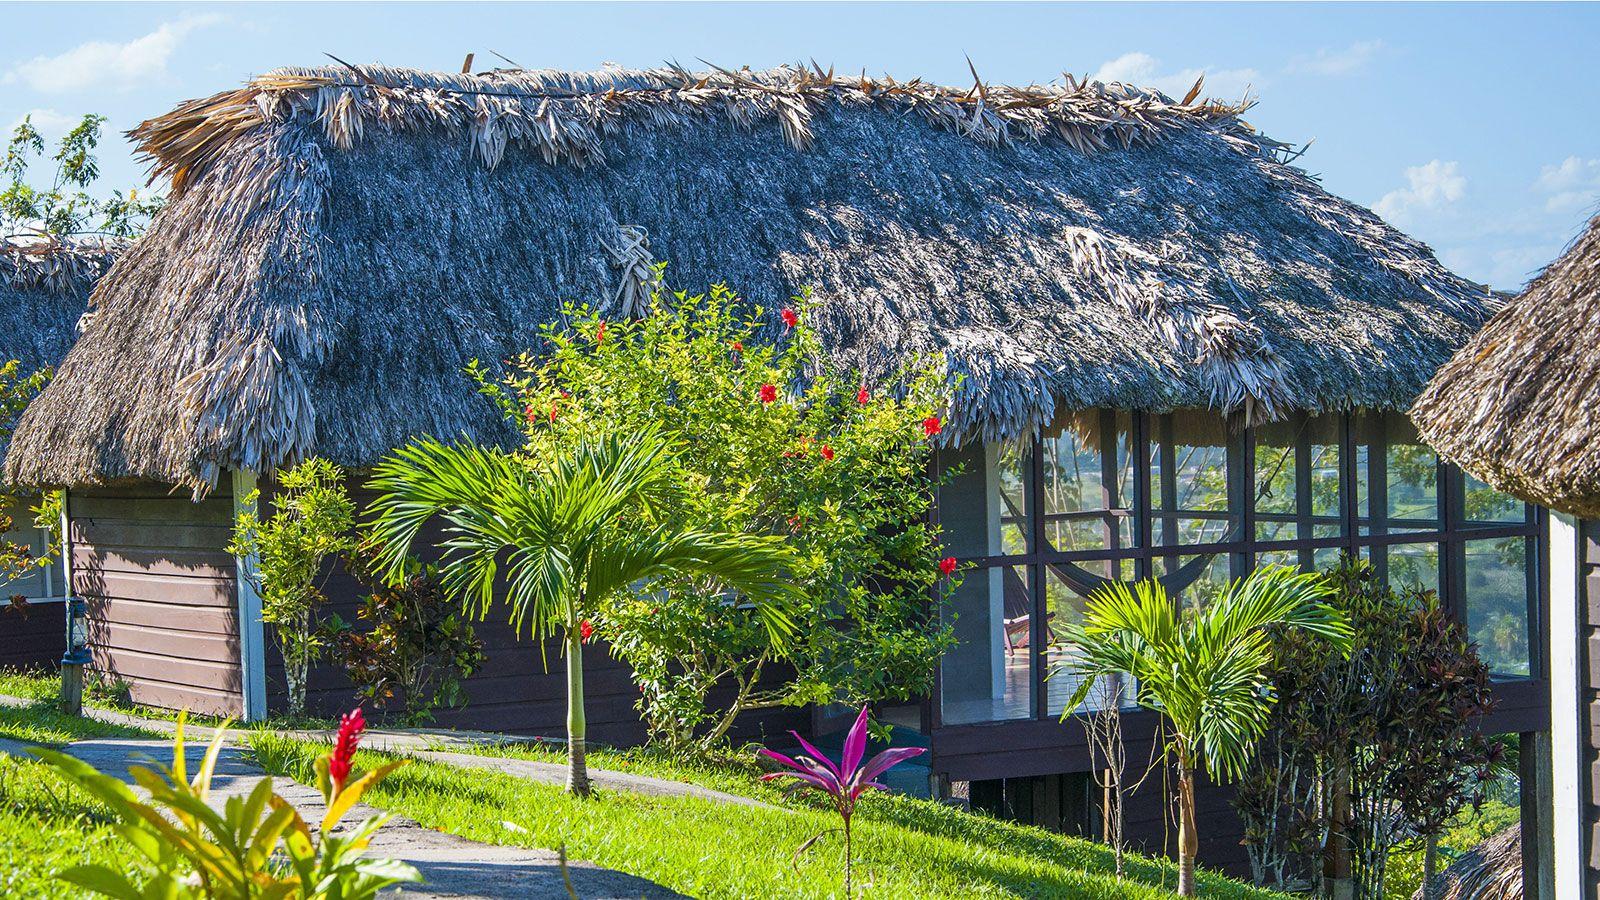 Belize Resort Accommodations Cahal Pech Village Resort